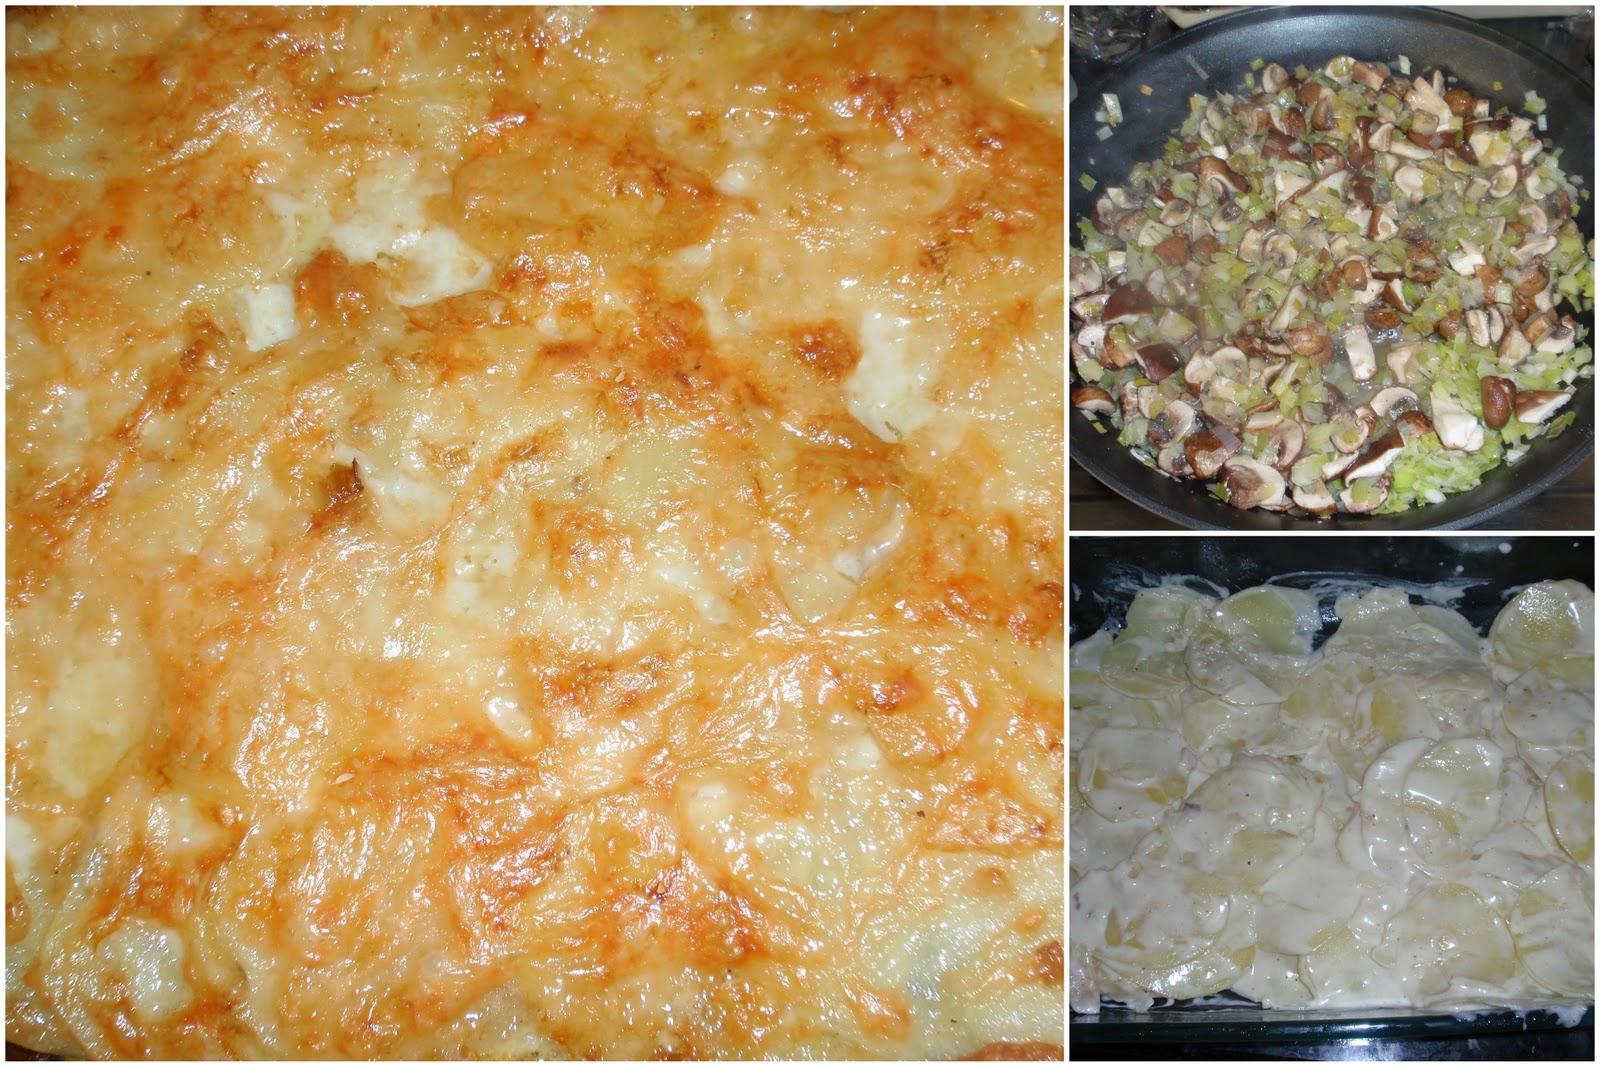 My Italian Grandmother: Potato and Mushroom Gratin with Gruyere